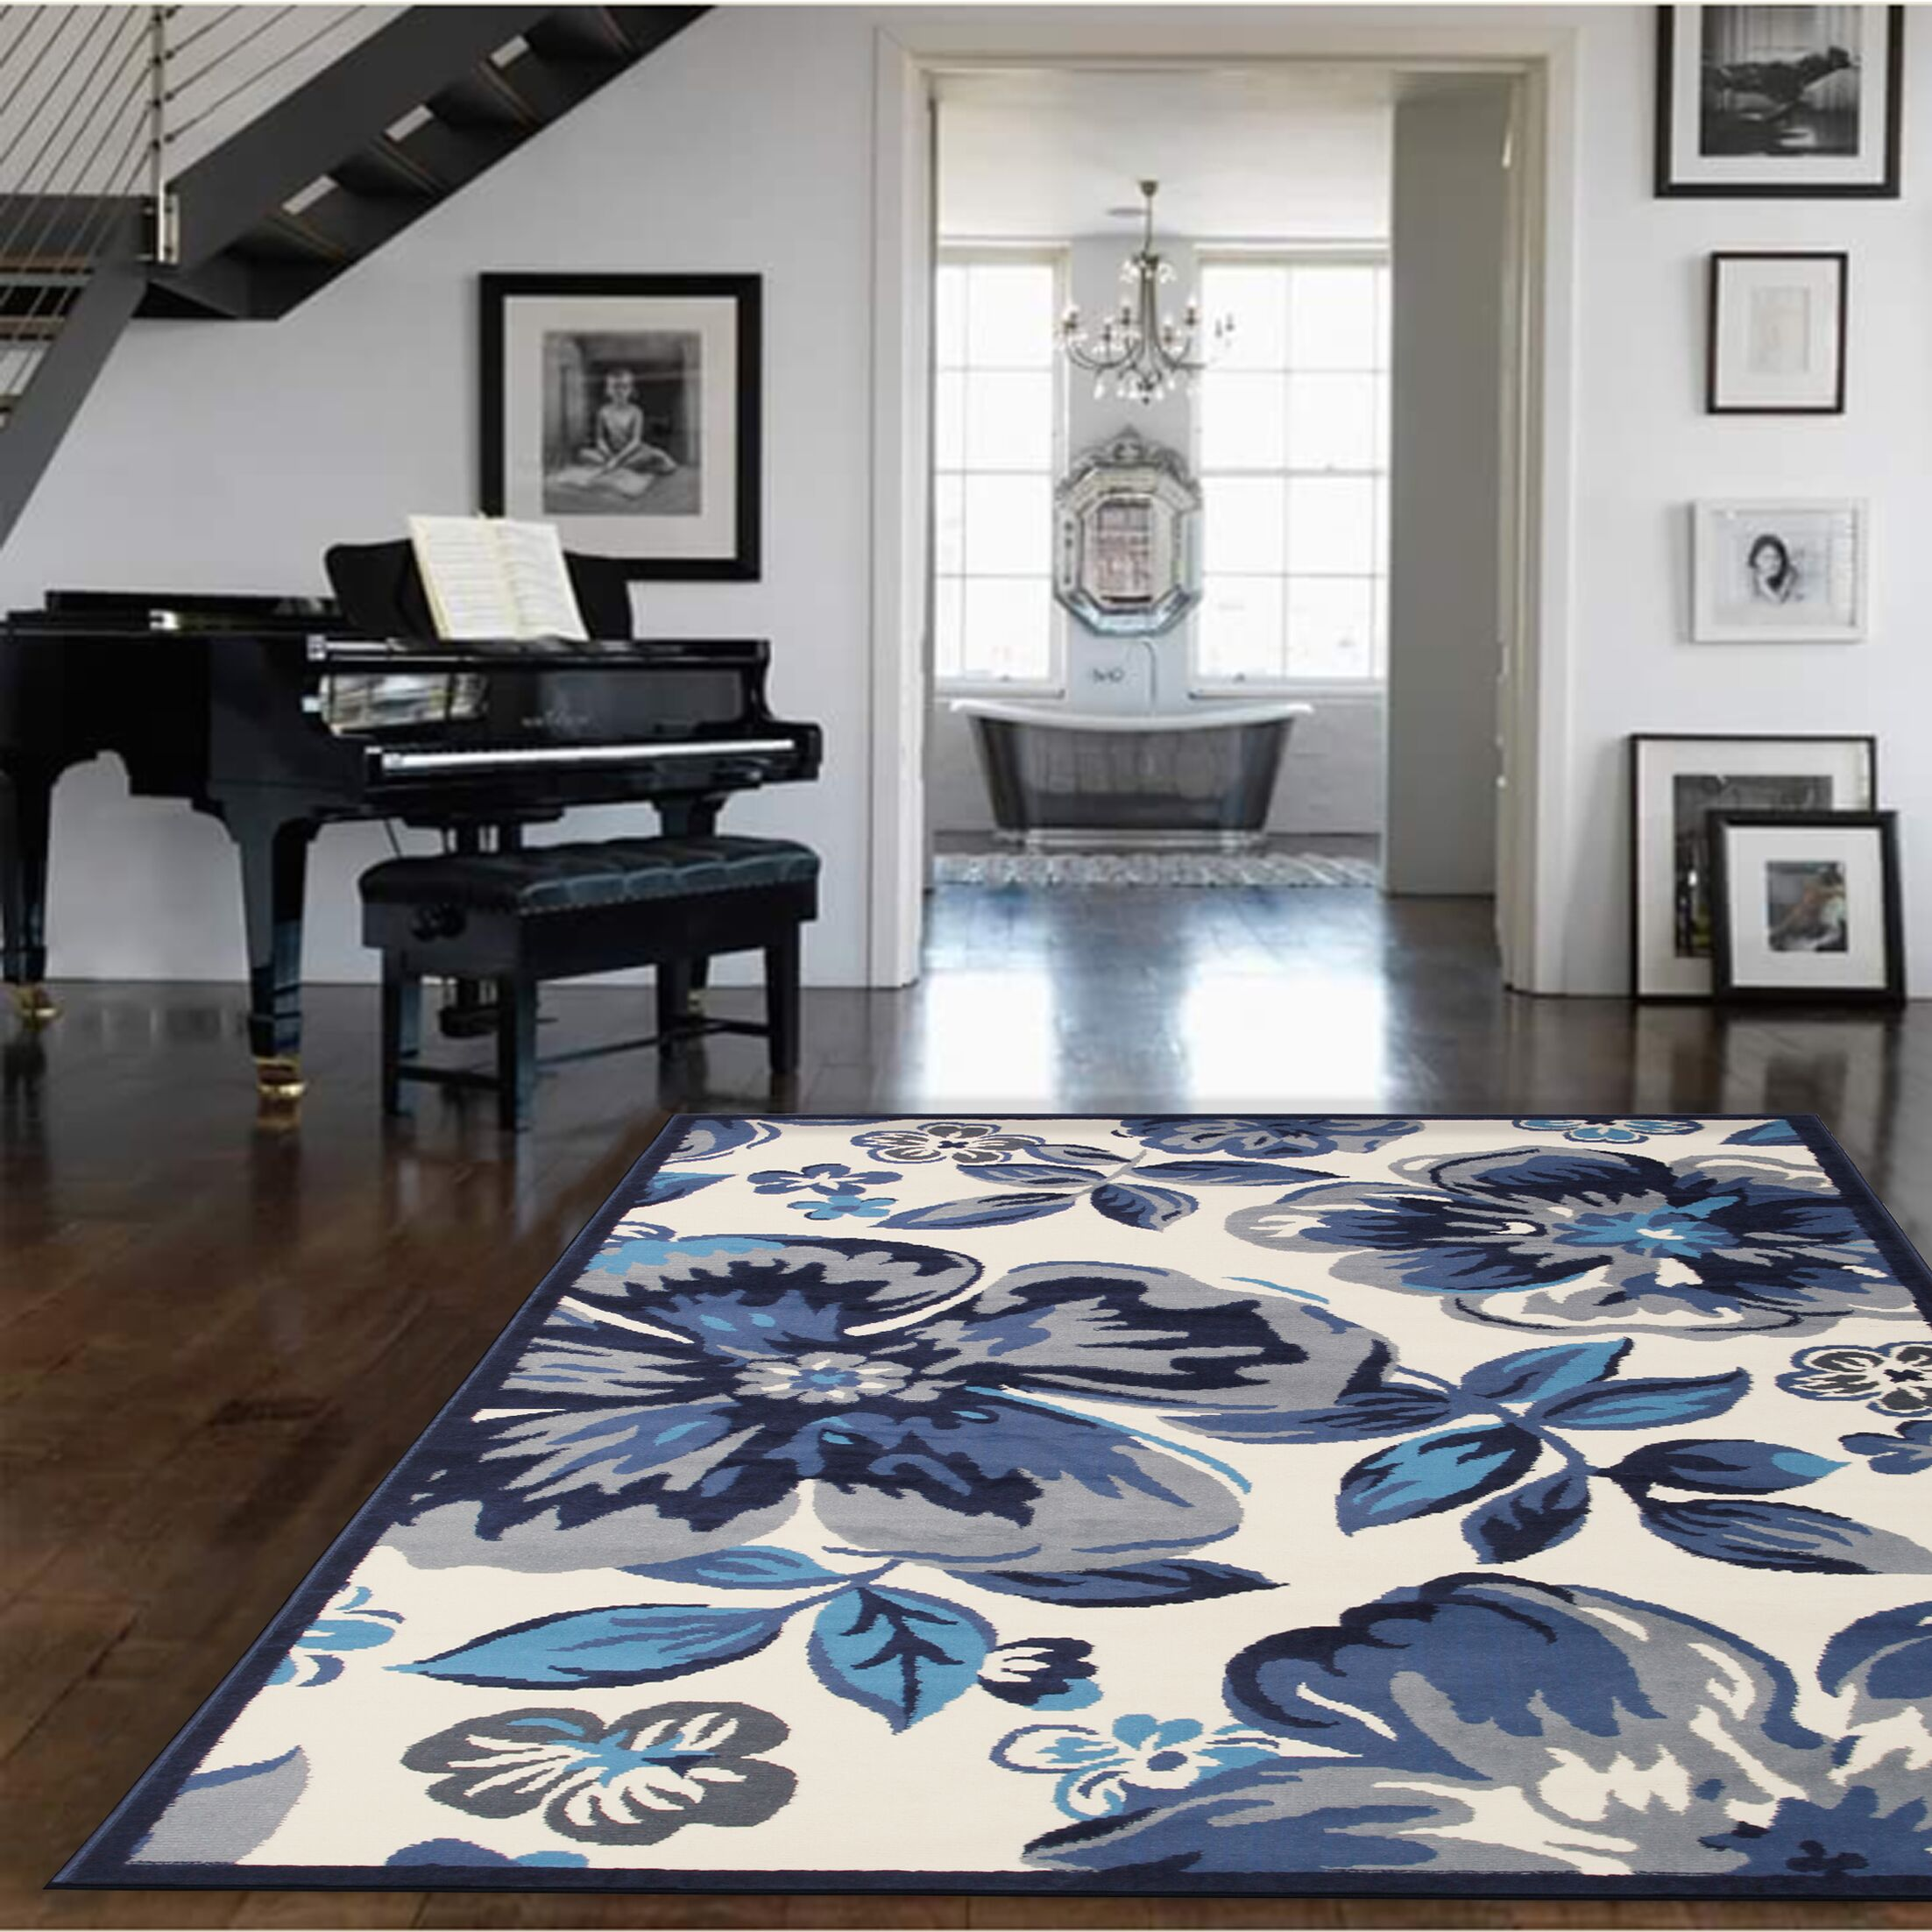 Bonner White/Blue Area Rug Rug Size: Rectangle 8' x 10'